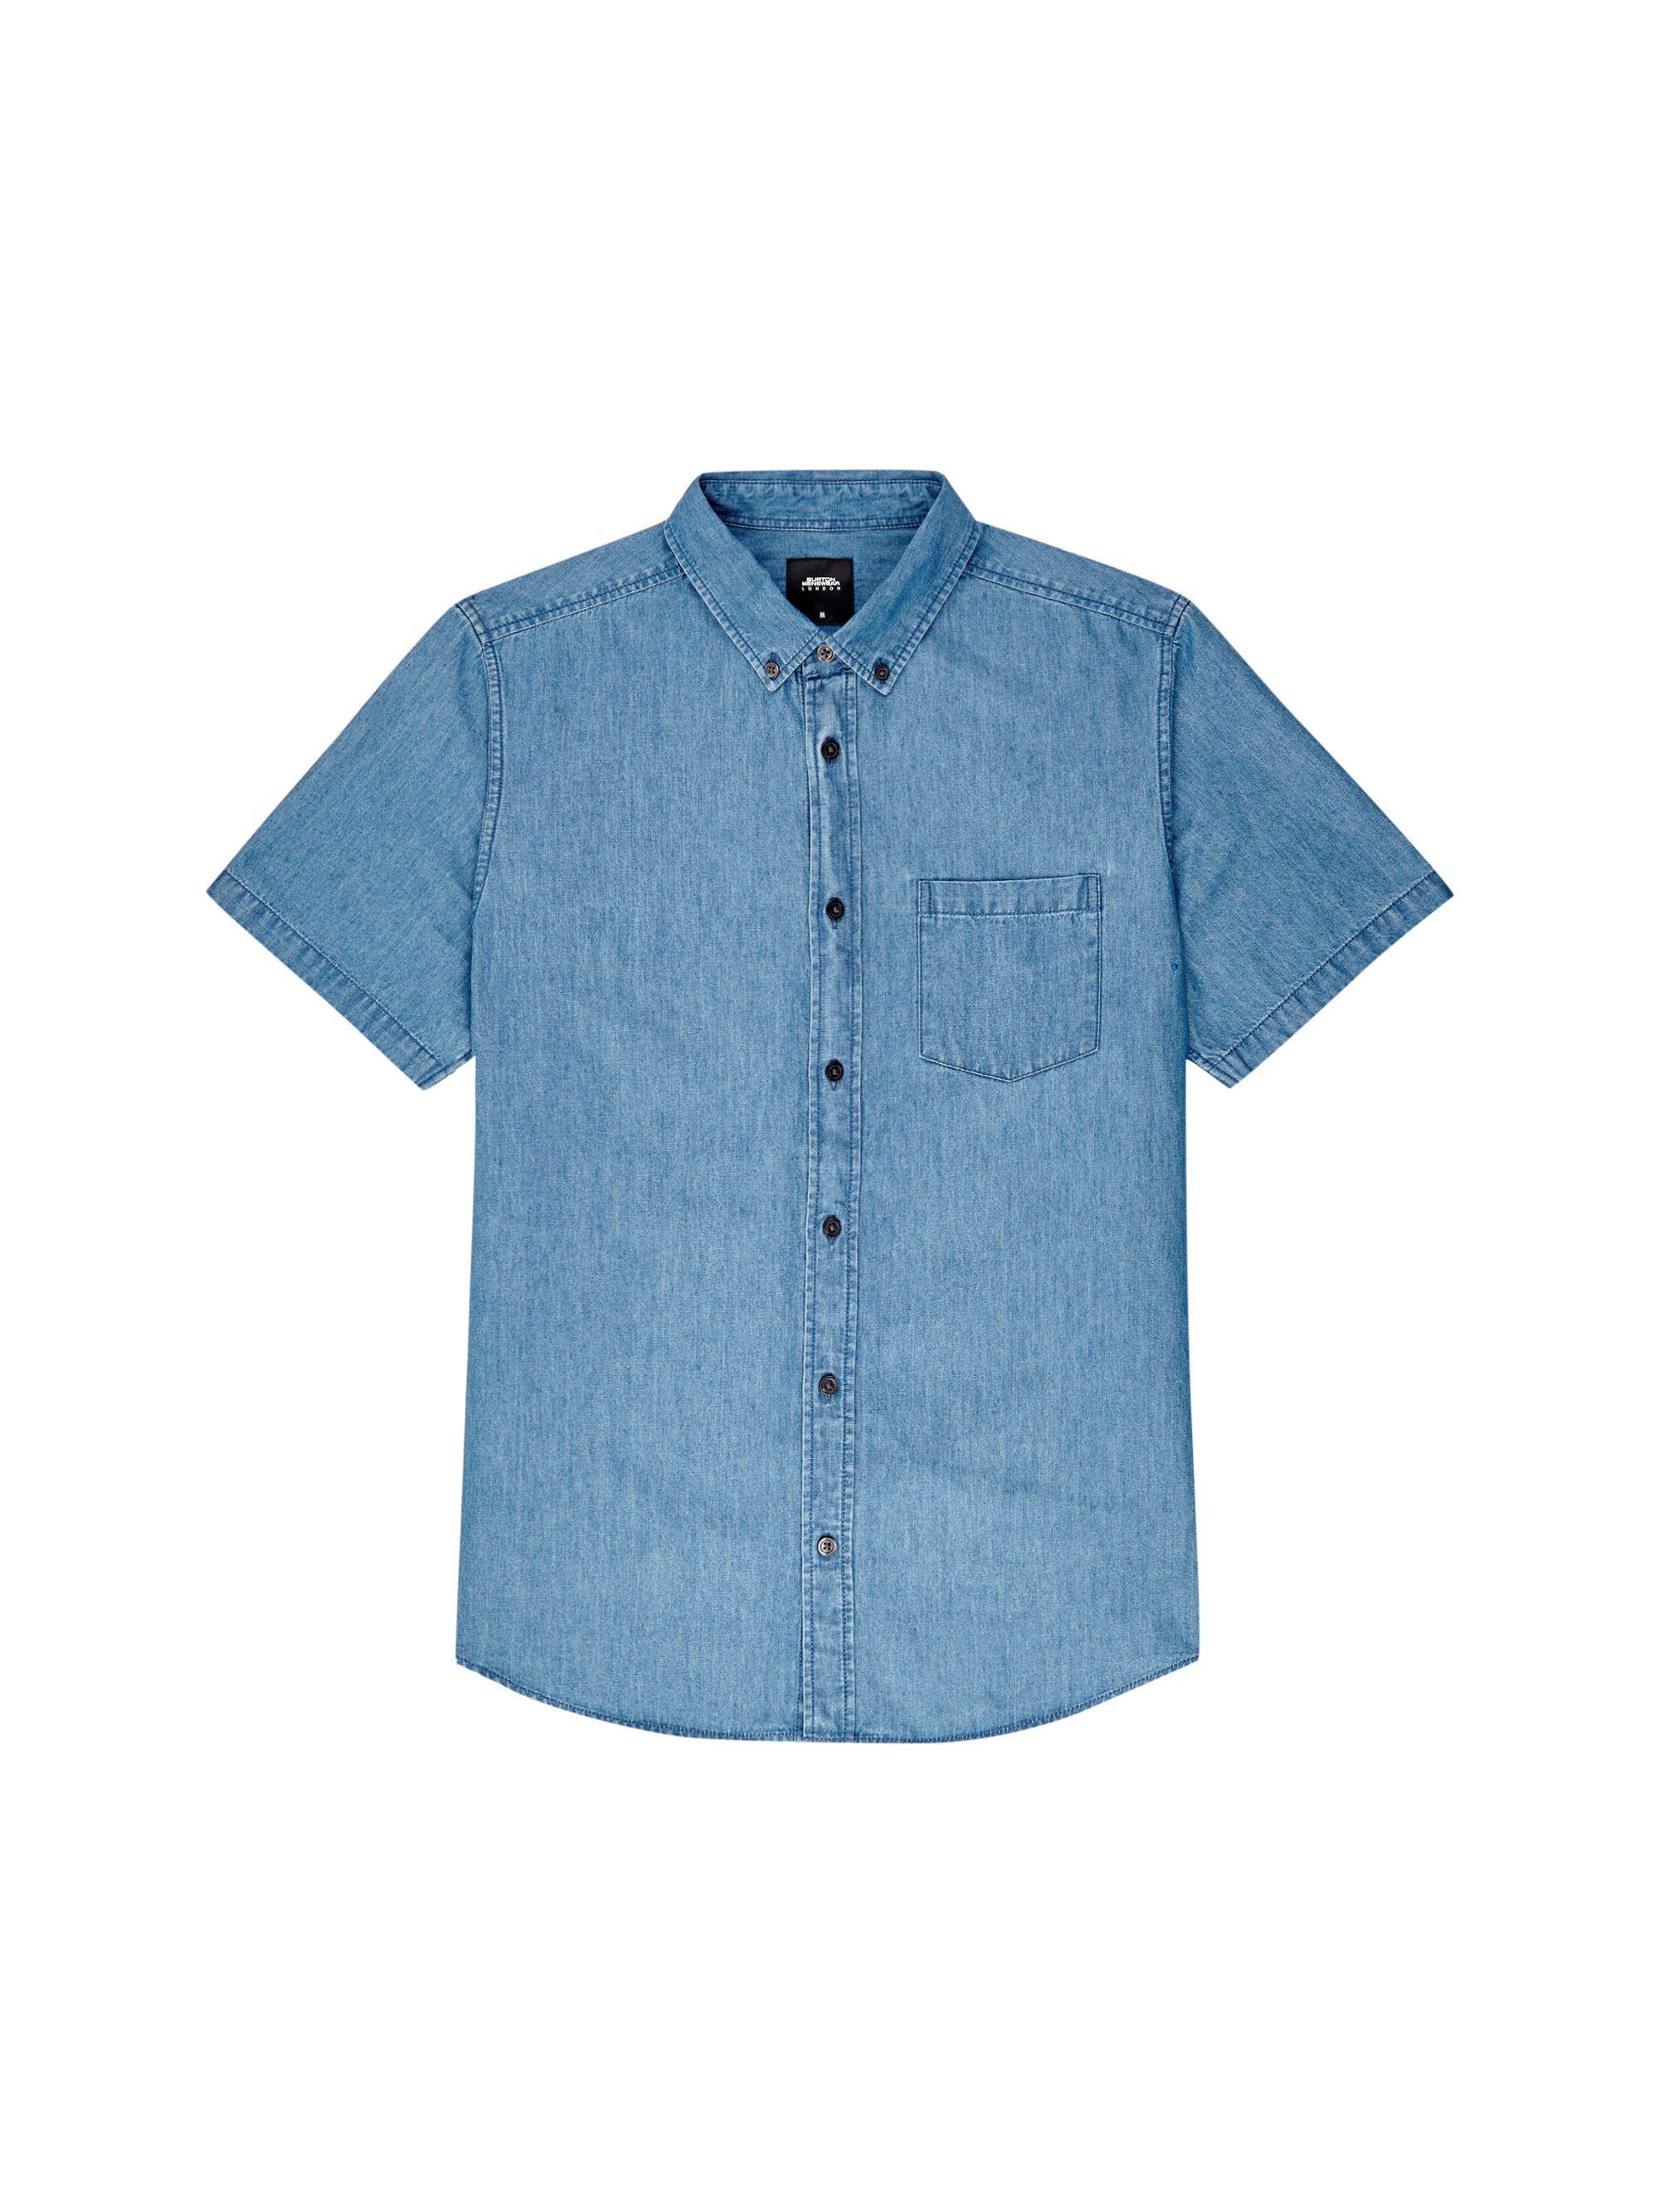 cf9011a01b Burton - Blue Mid Wash Short Sleeve Denim Shirt for Men - Lyst. View  fullscreen